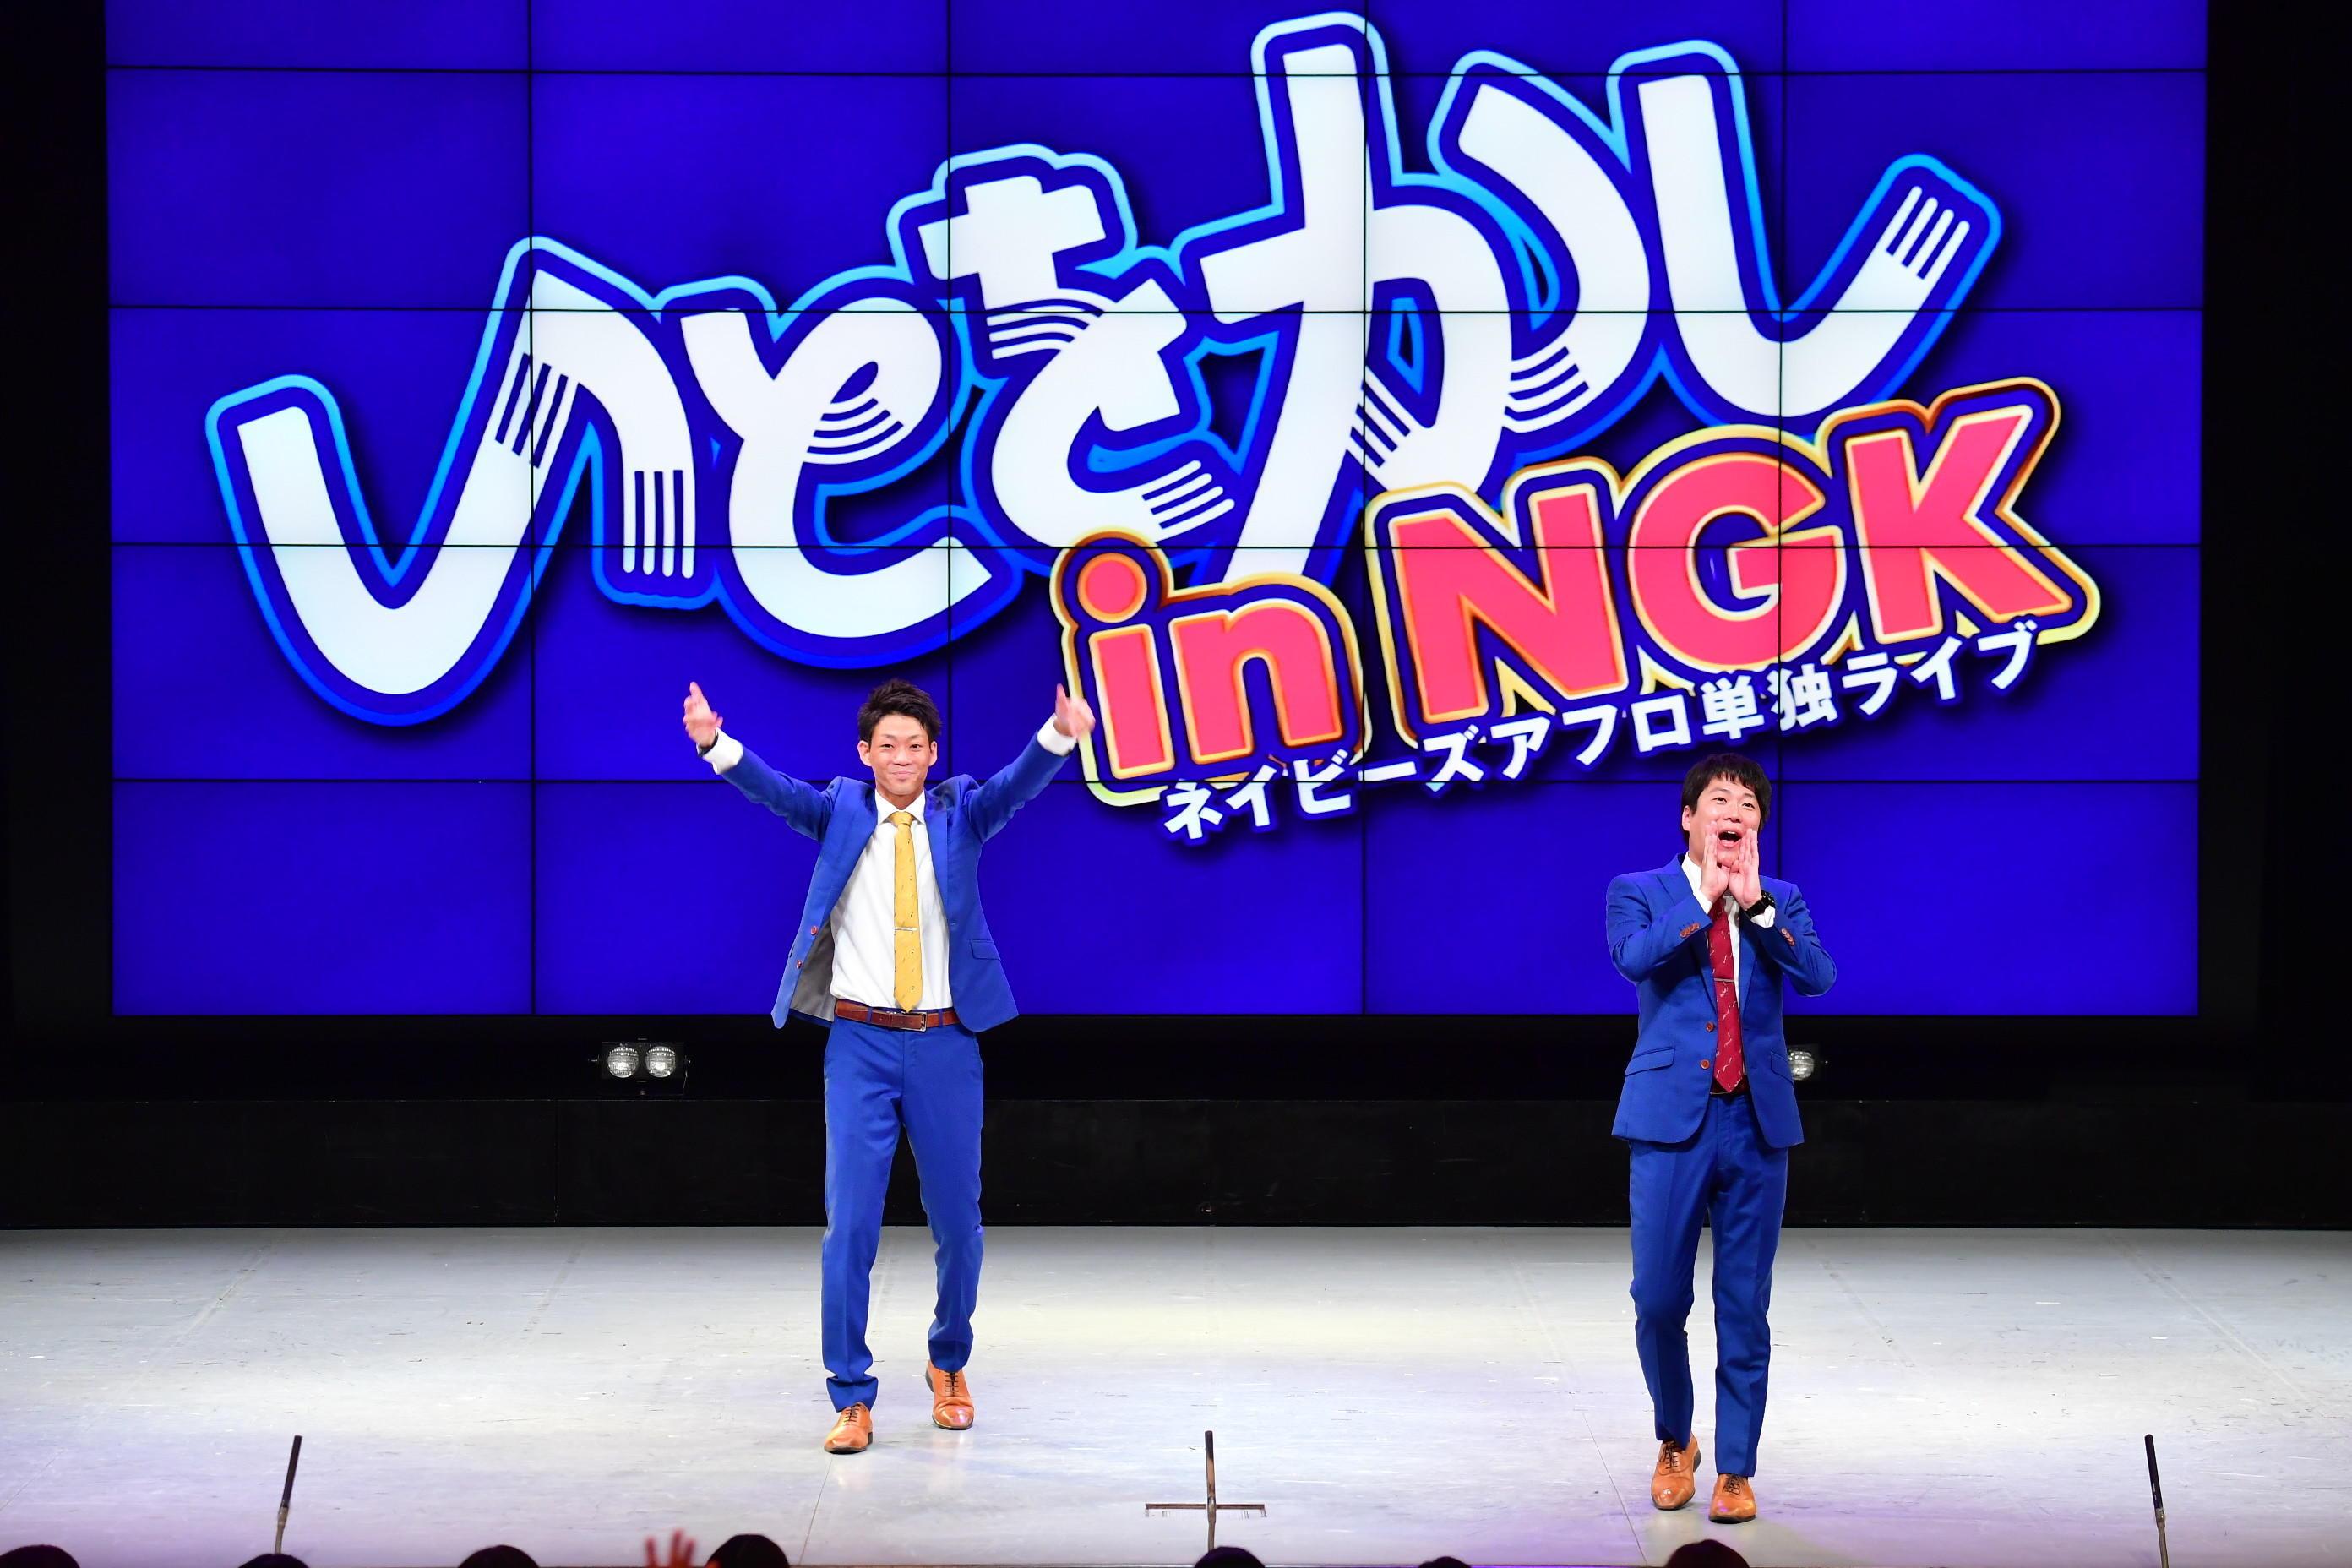 http://news.yoshimoto.co.jp/20180829234140-9abad13fca51e7d47cdbcc95dd3b1525601a599e.jpg